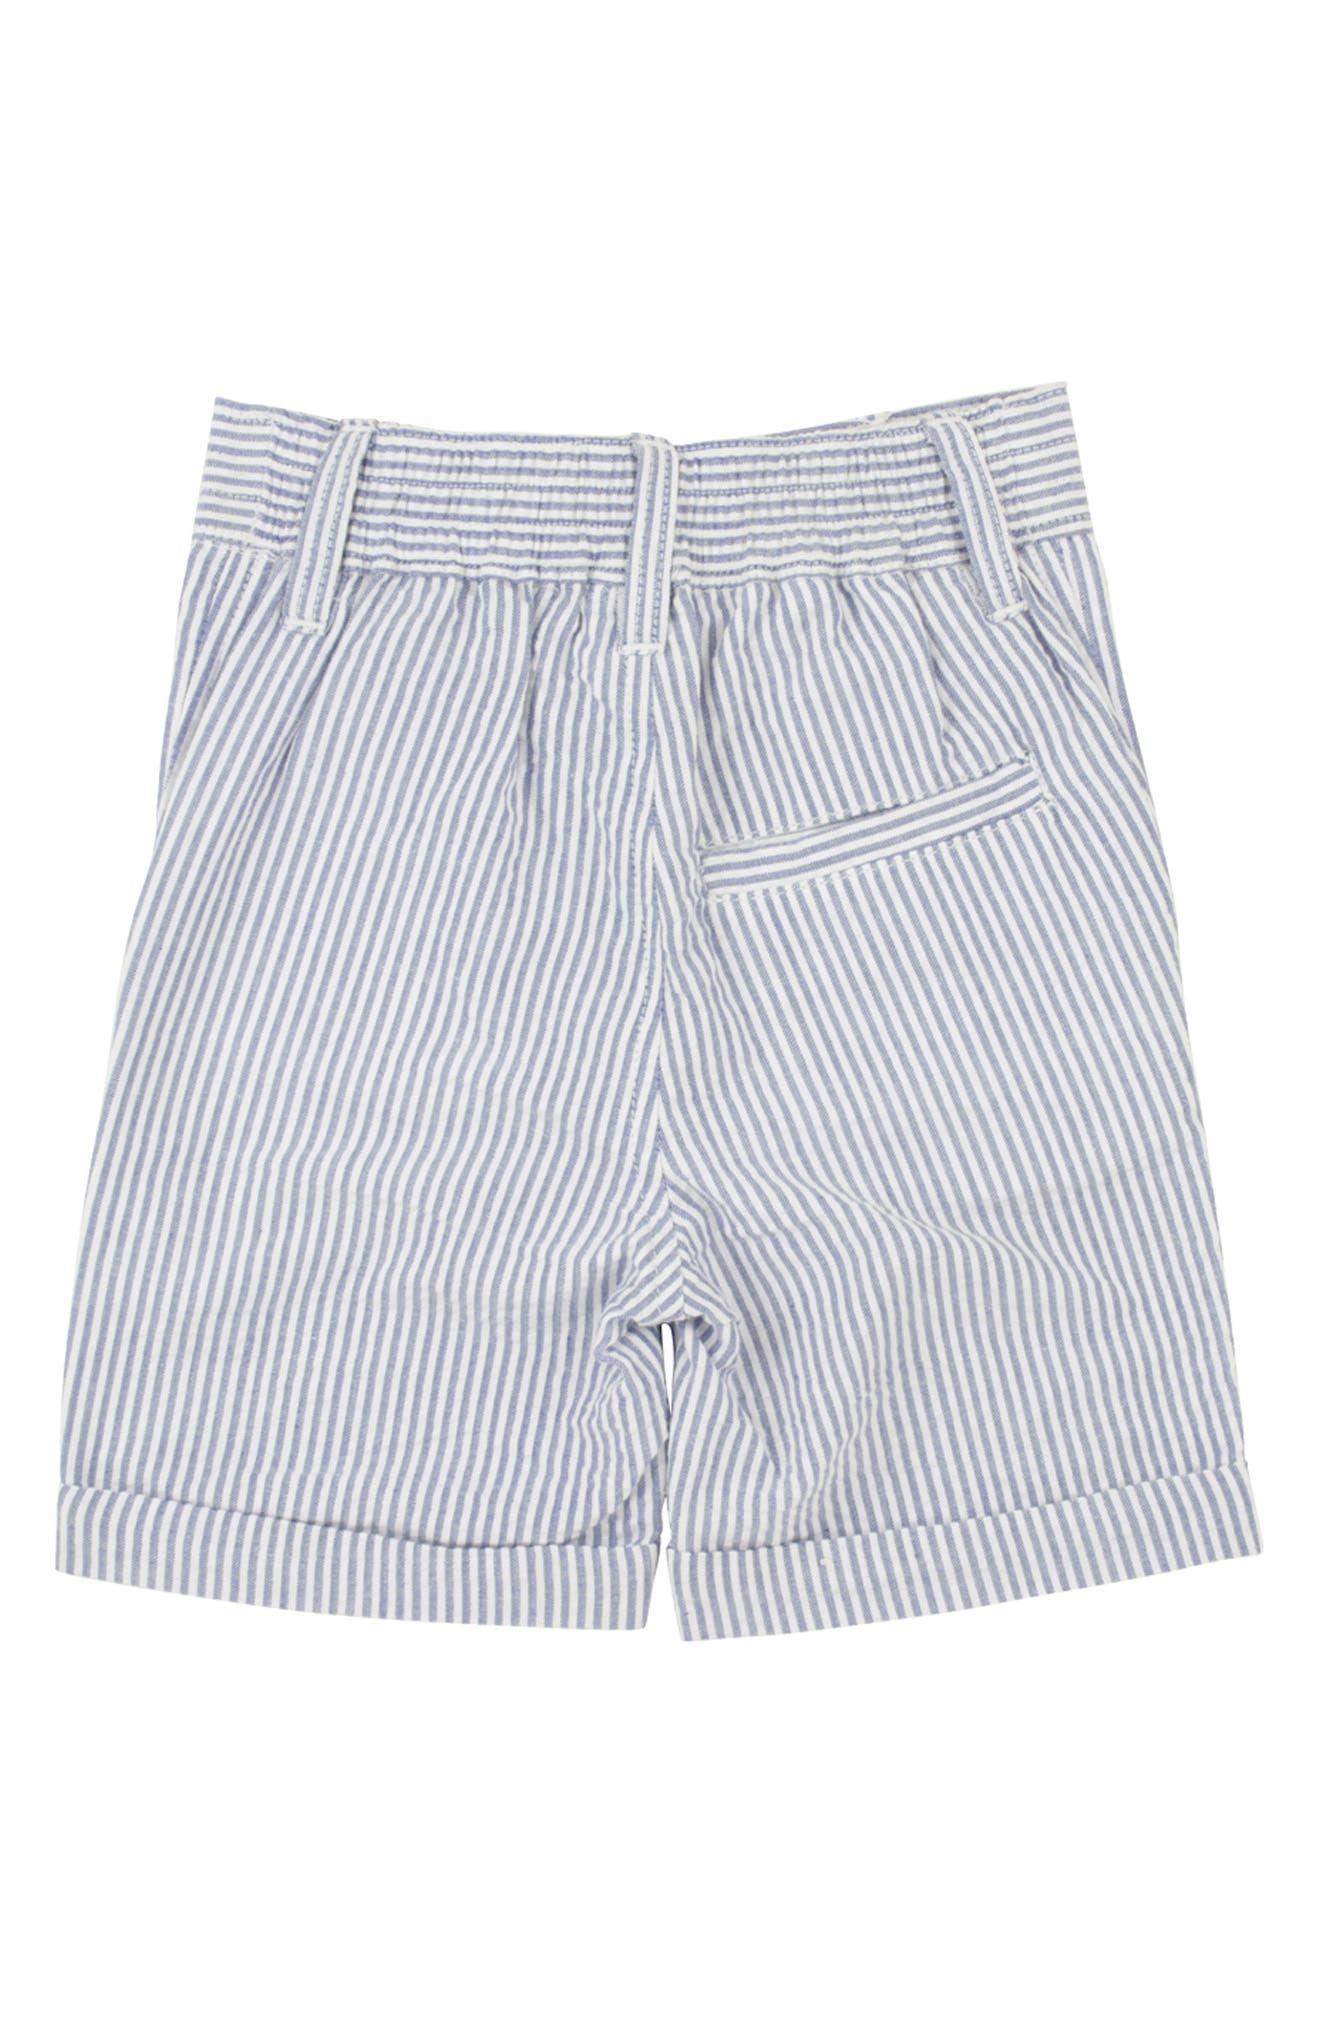 Seersucker Vest & Shorts Set,                             Alternate thumbnail 3, color,                             BLUE